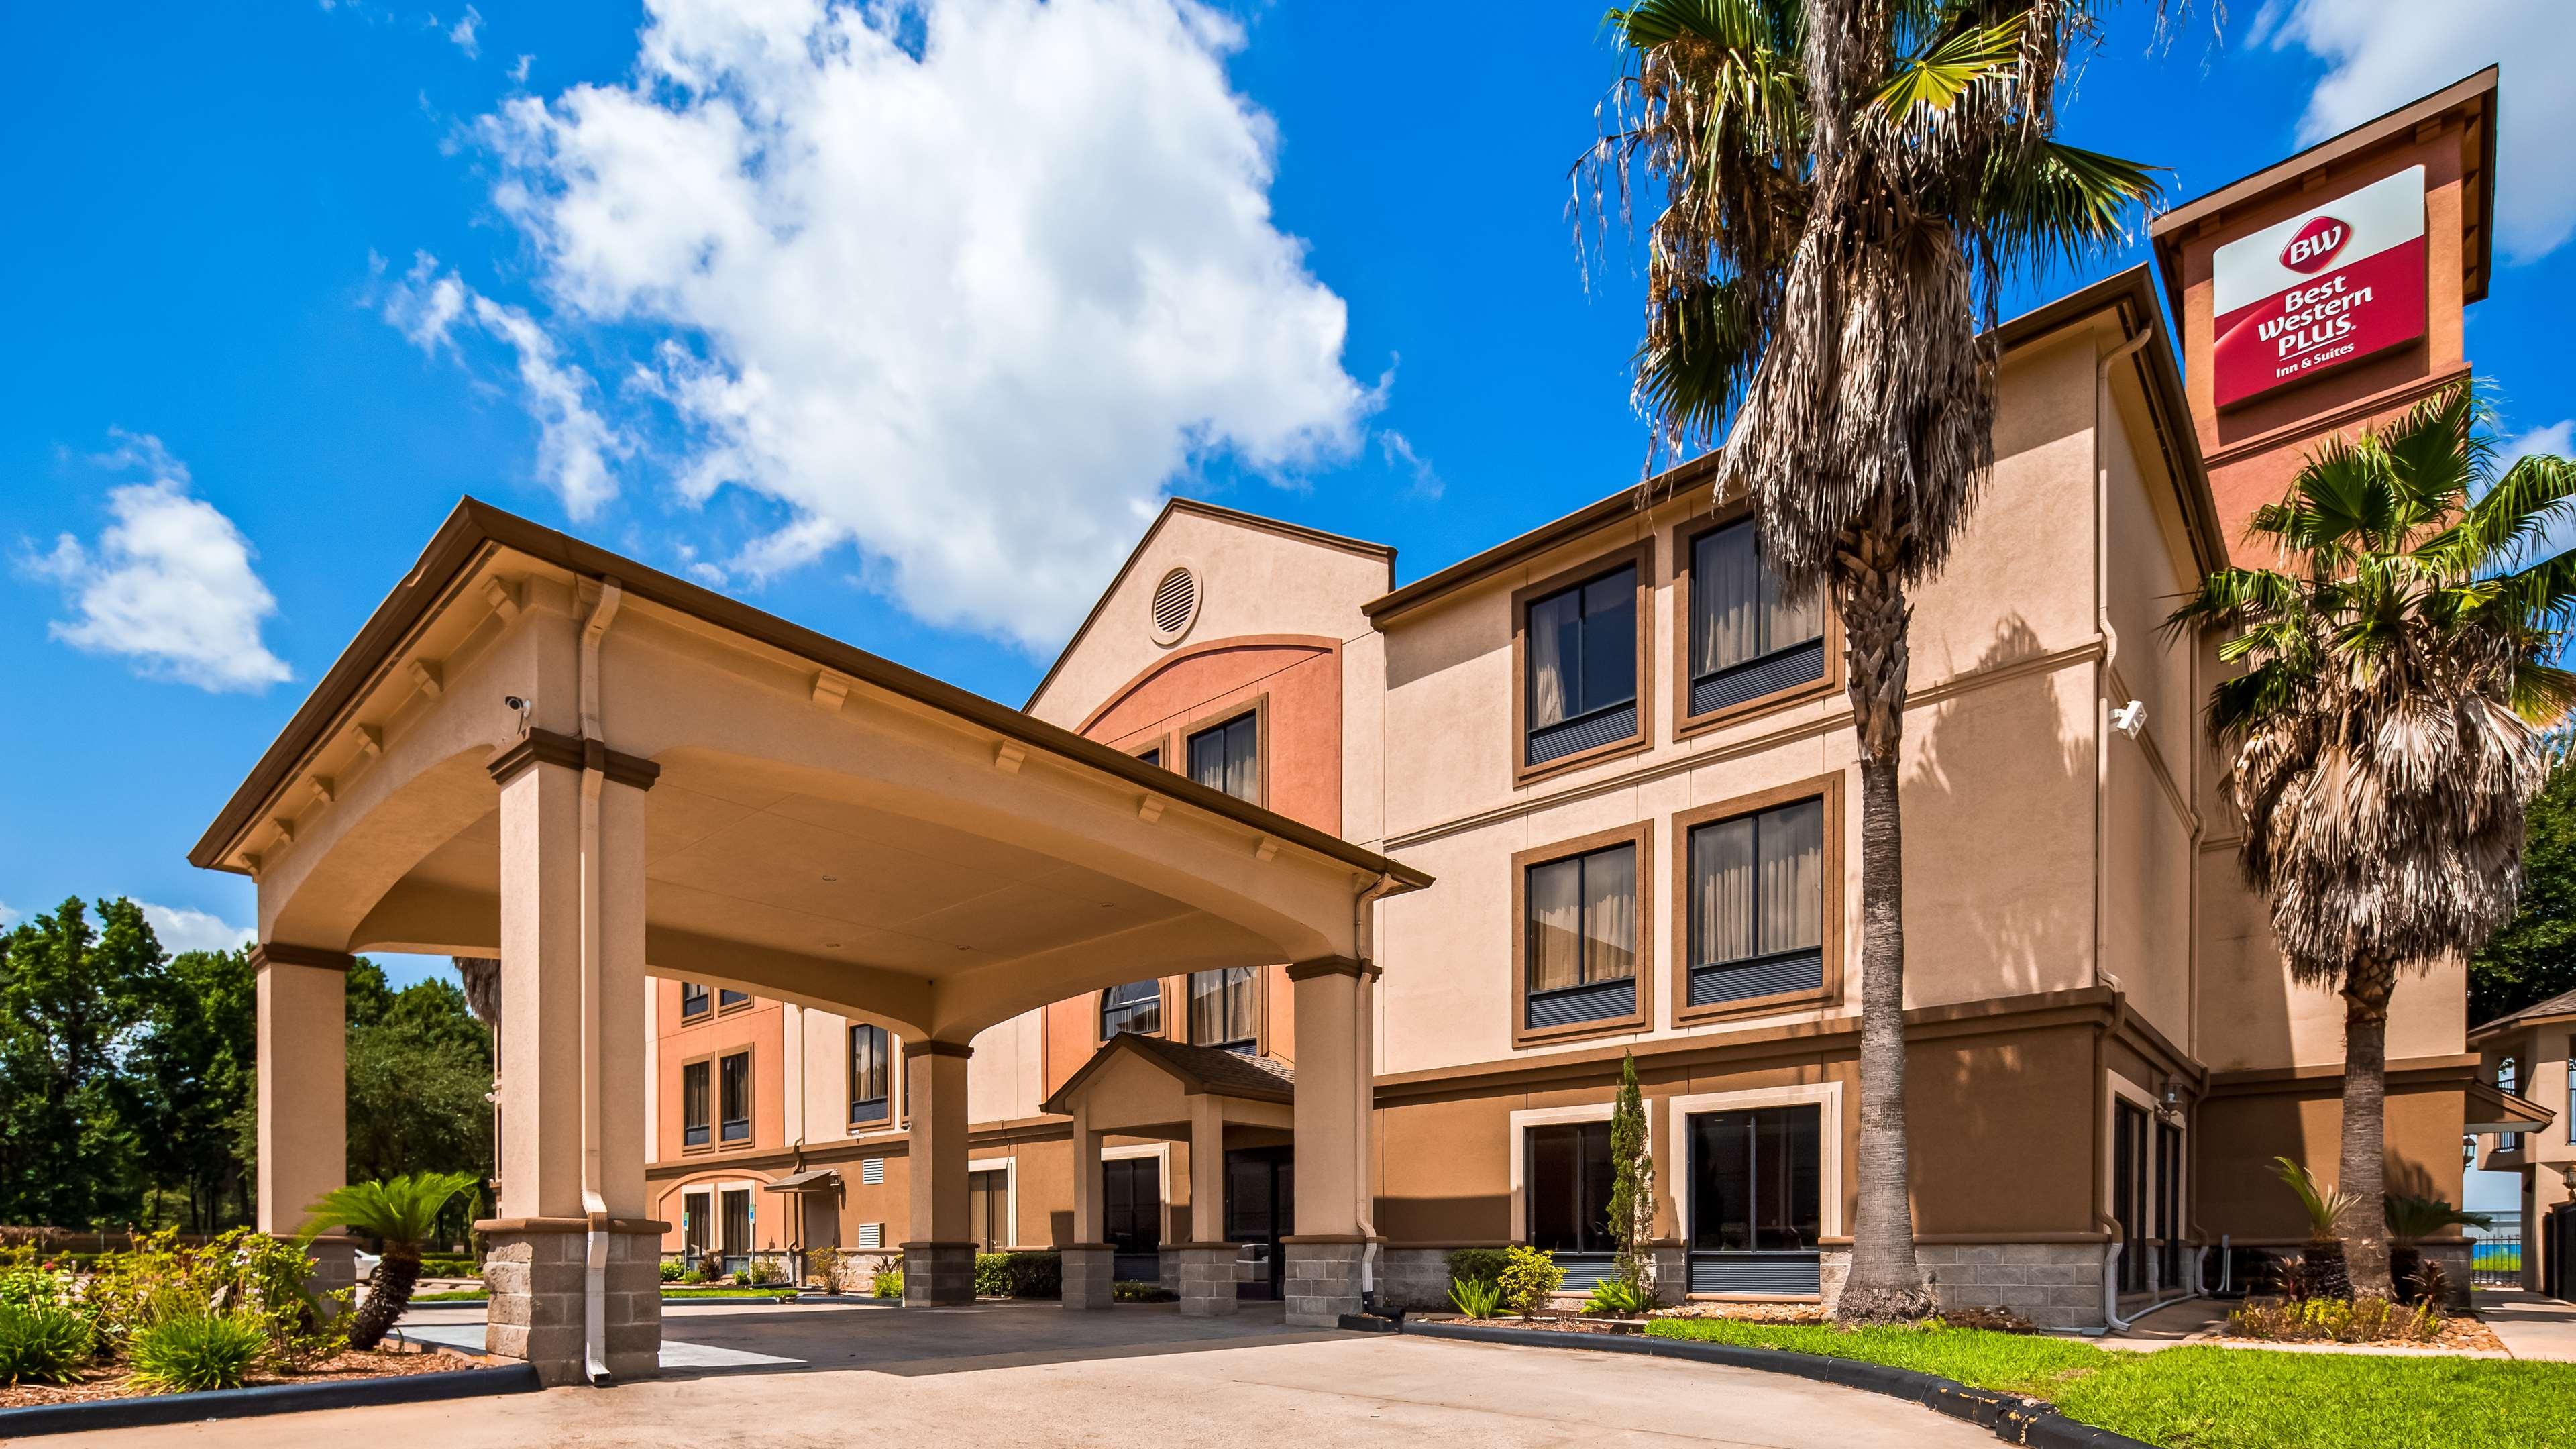 Best Western Plus North Houston Inn & Suites image 0